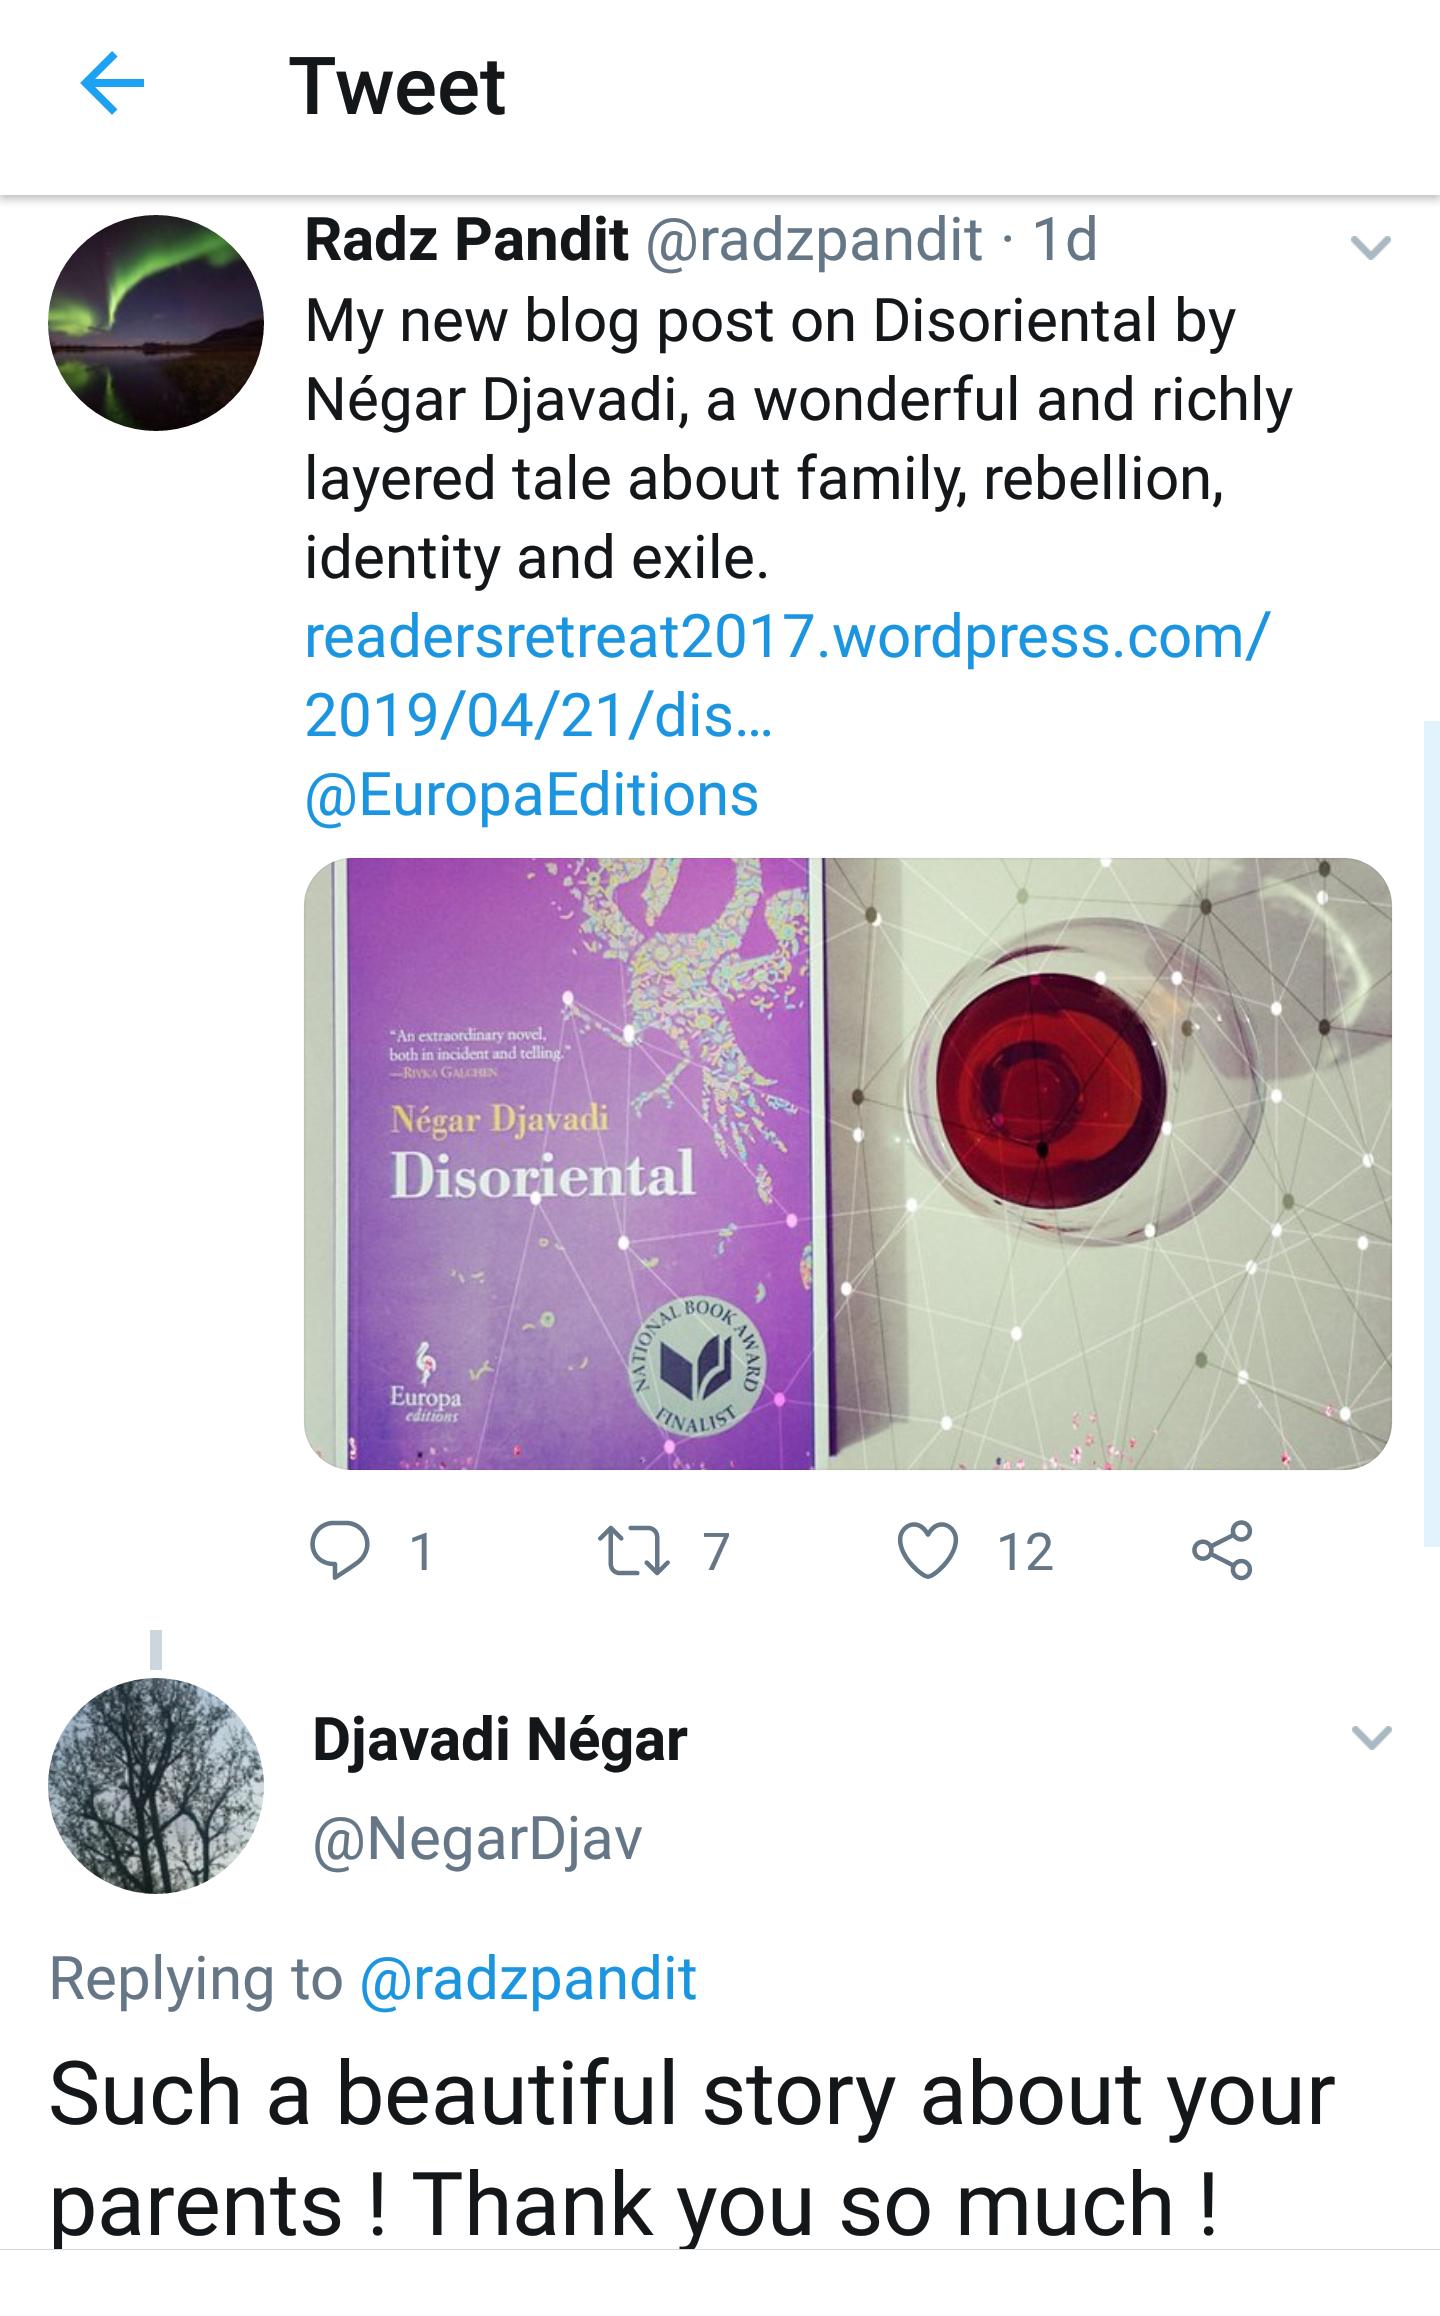 Djavadi reply